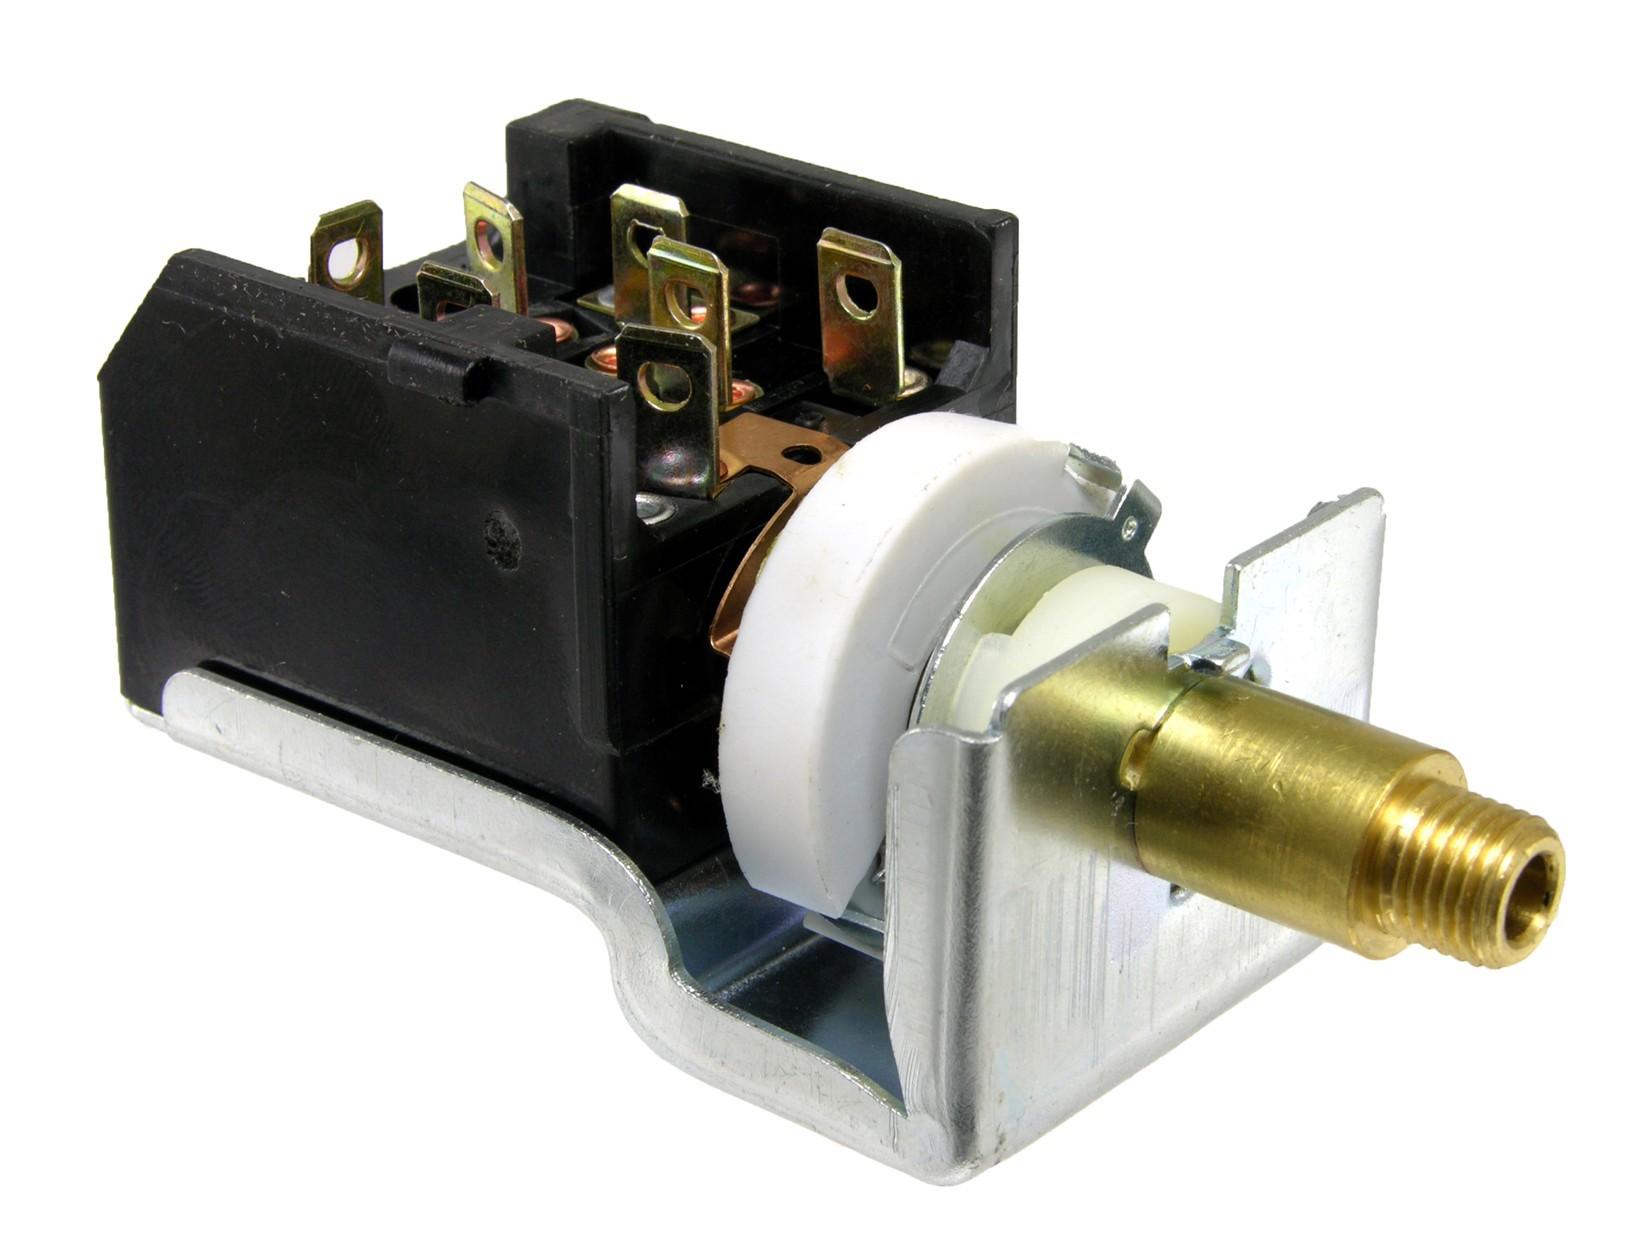 headlight switch wells sw186 fits 79-86 jeep cj7 | ebay 86 jeep cj7 headlight wiring